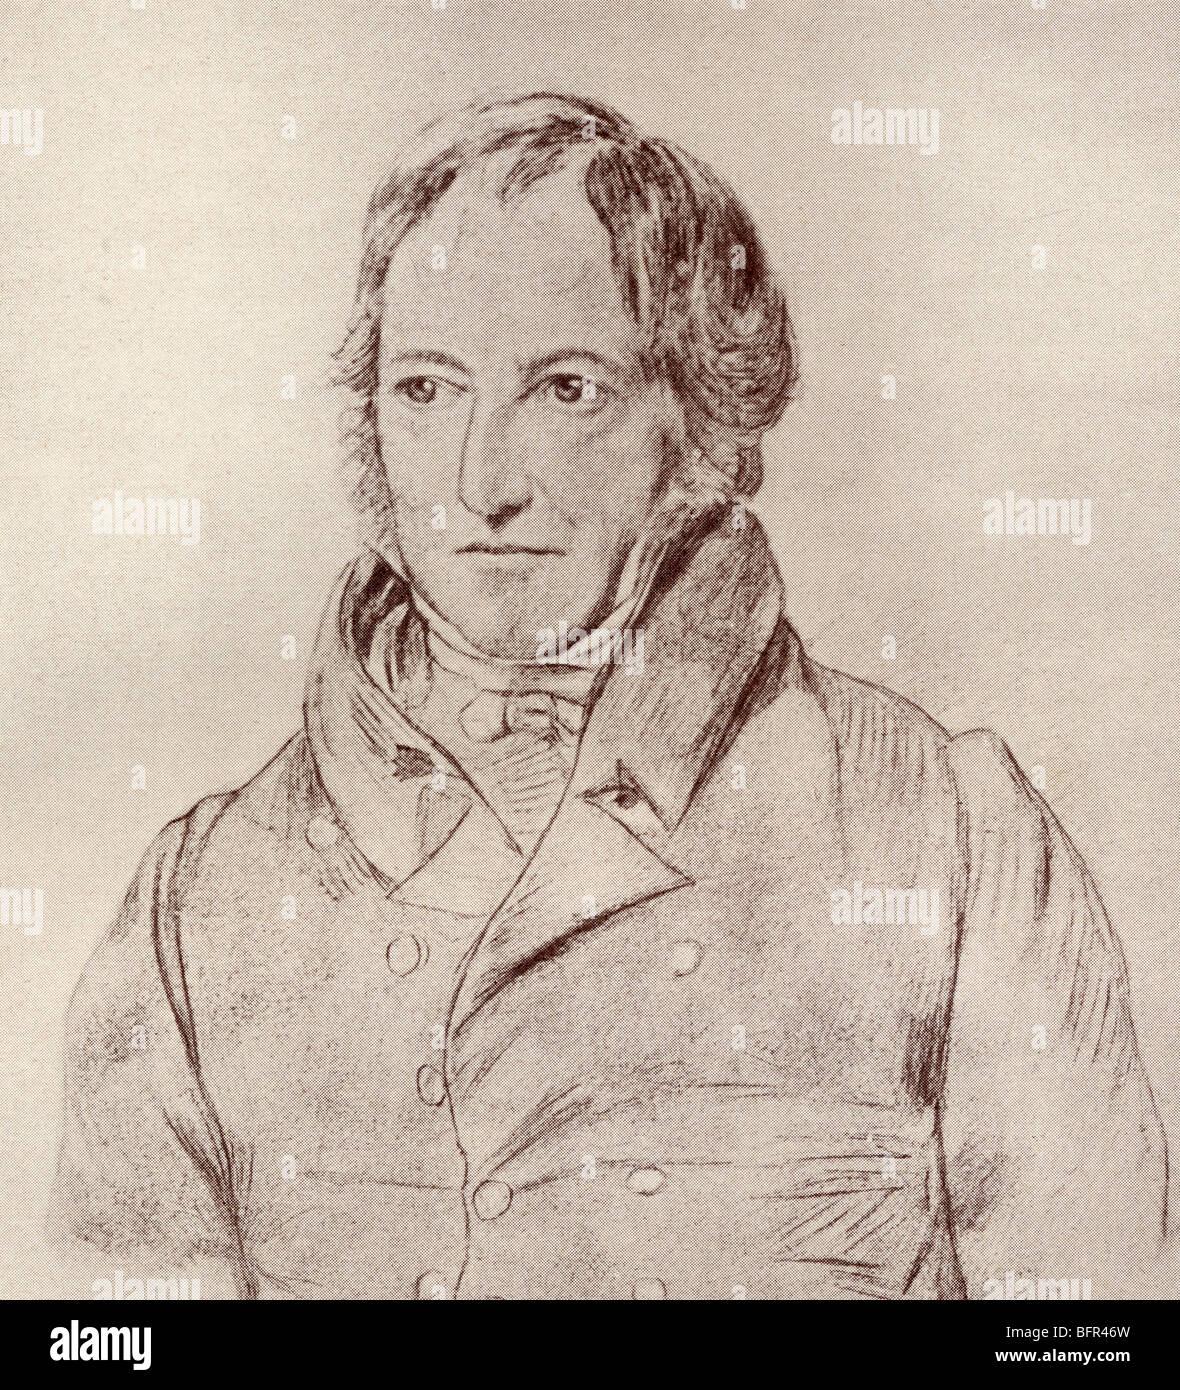 Georg Wilhelm Friedrich Hegel, 1770 to 1831. German philosopher. - Stock Image